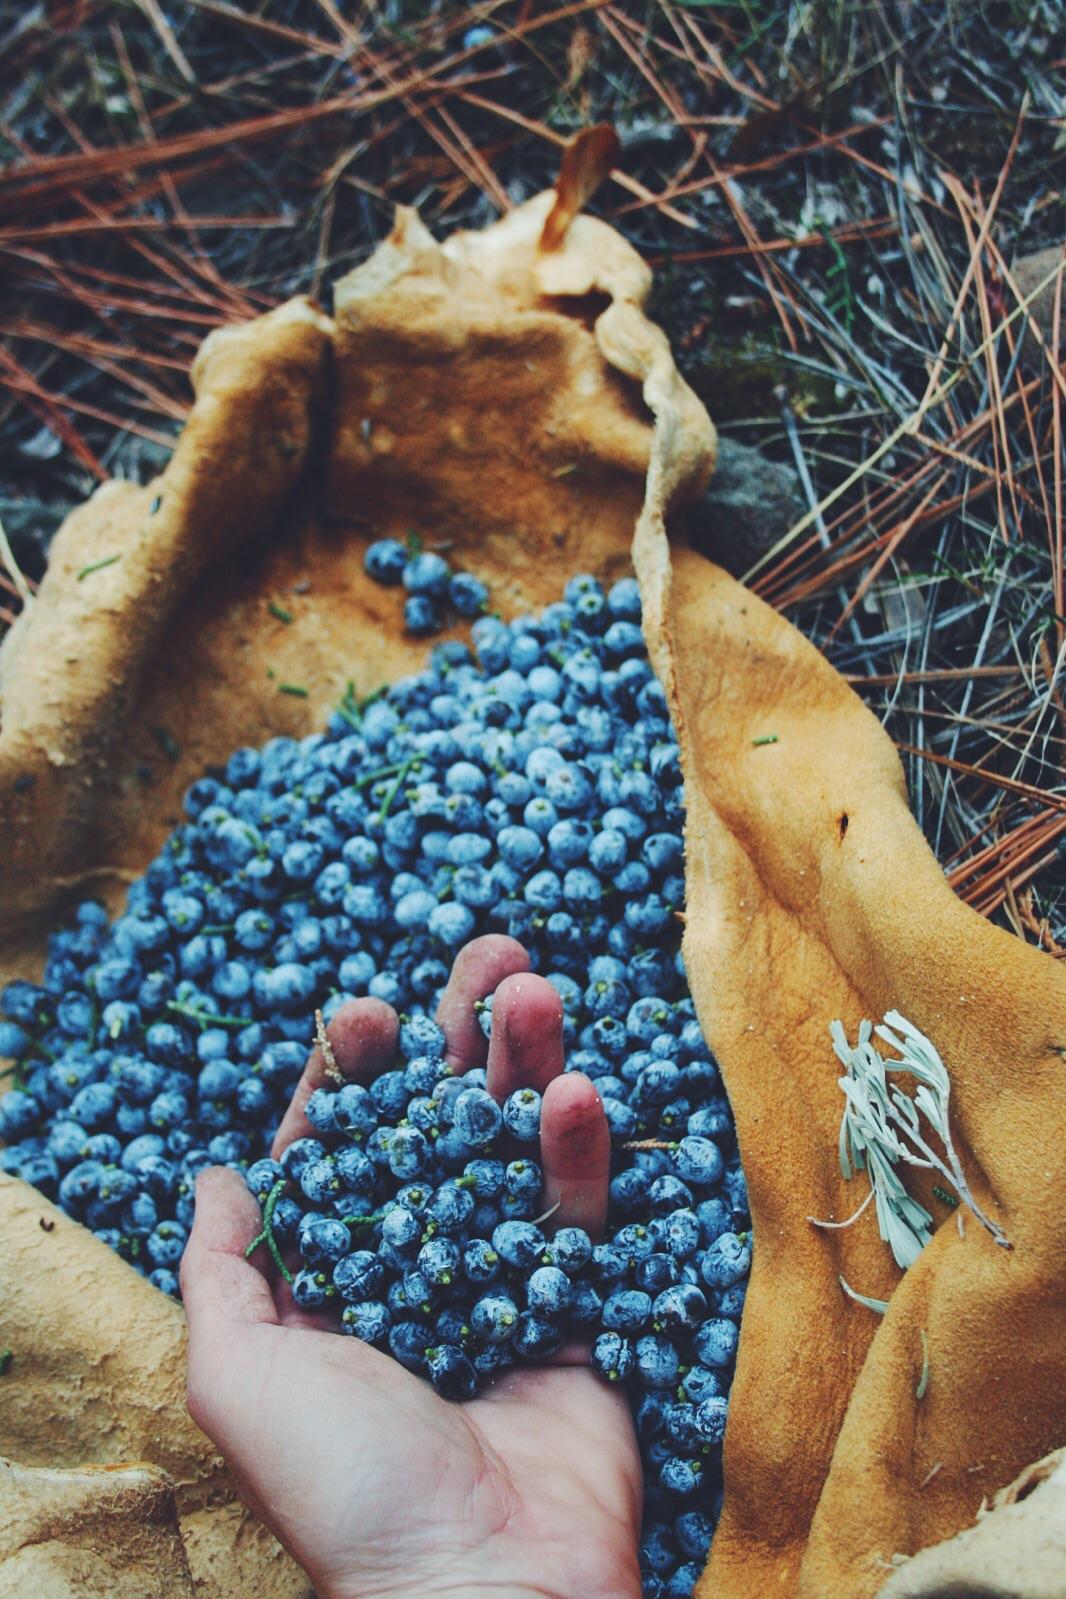 'berries' of Juniper. Near Sierraville, CA.